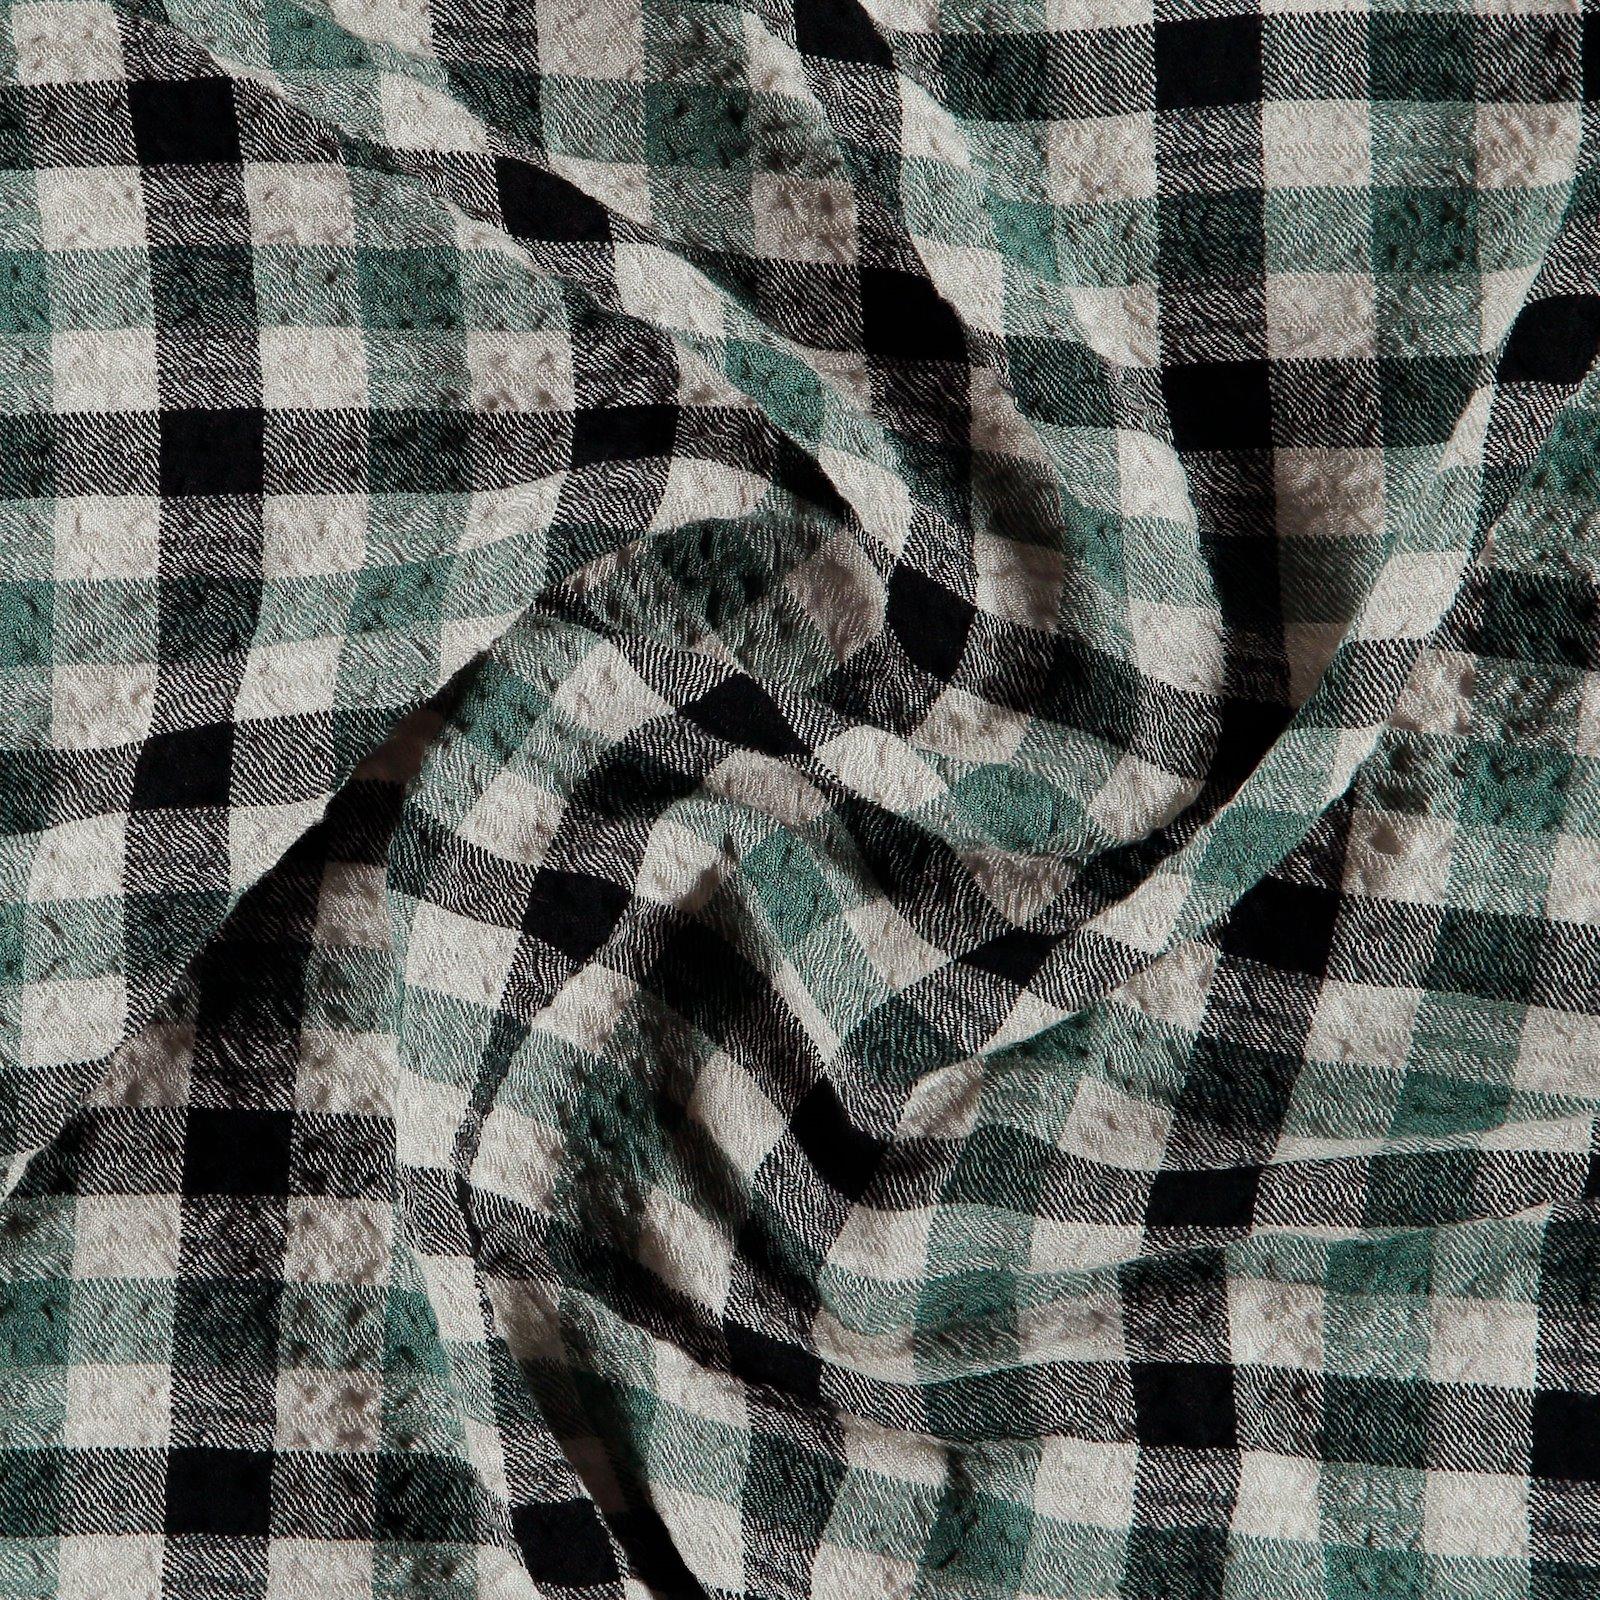 Viskose gewebt mit Struktur, Grün/Offwh. 701096_pack